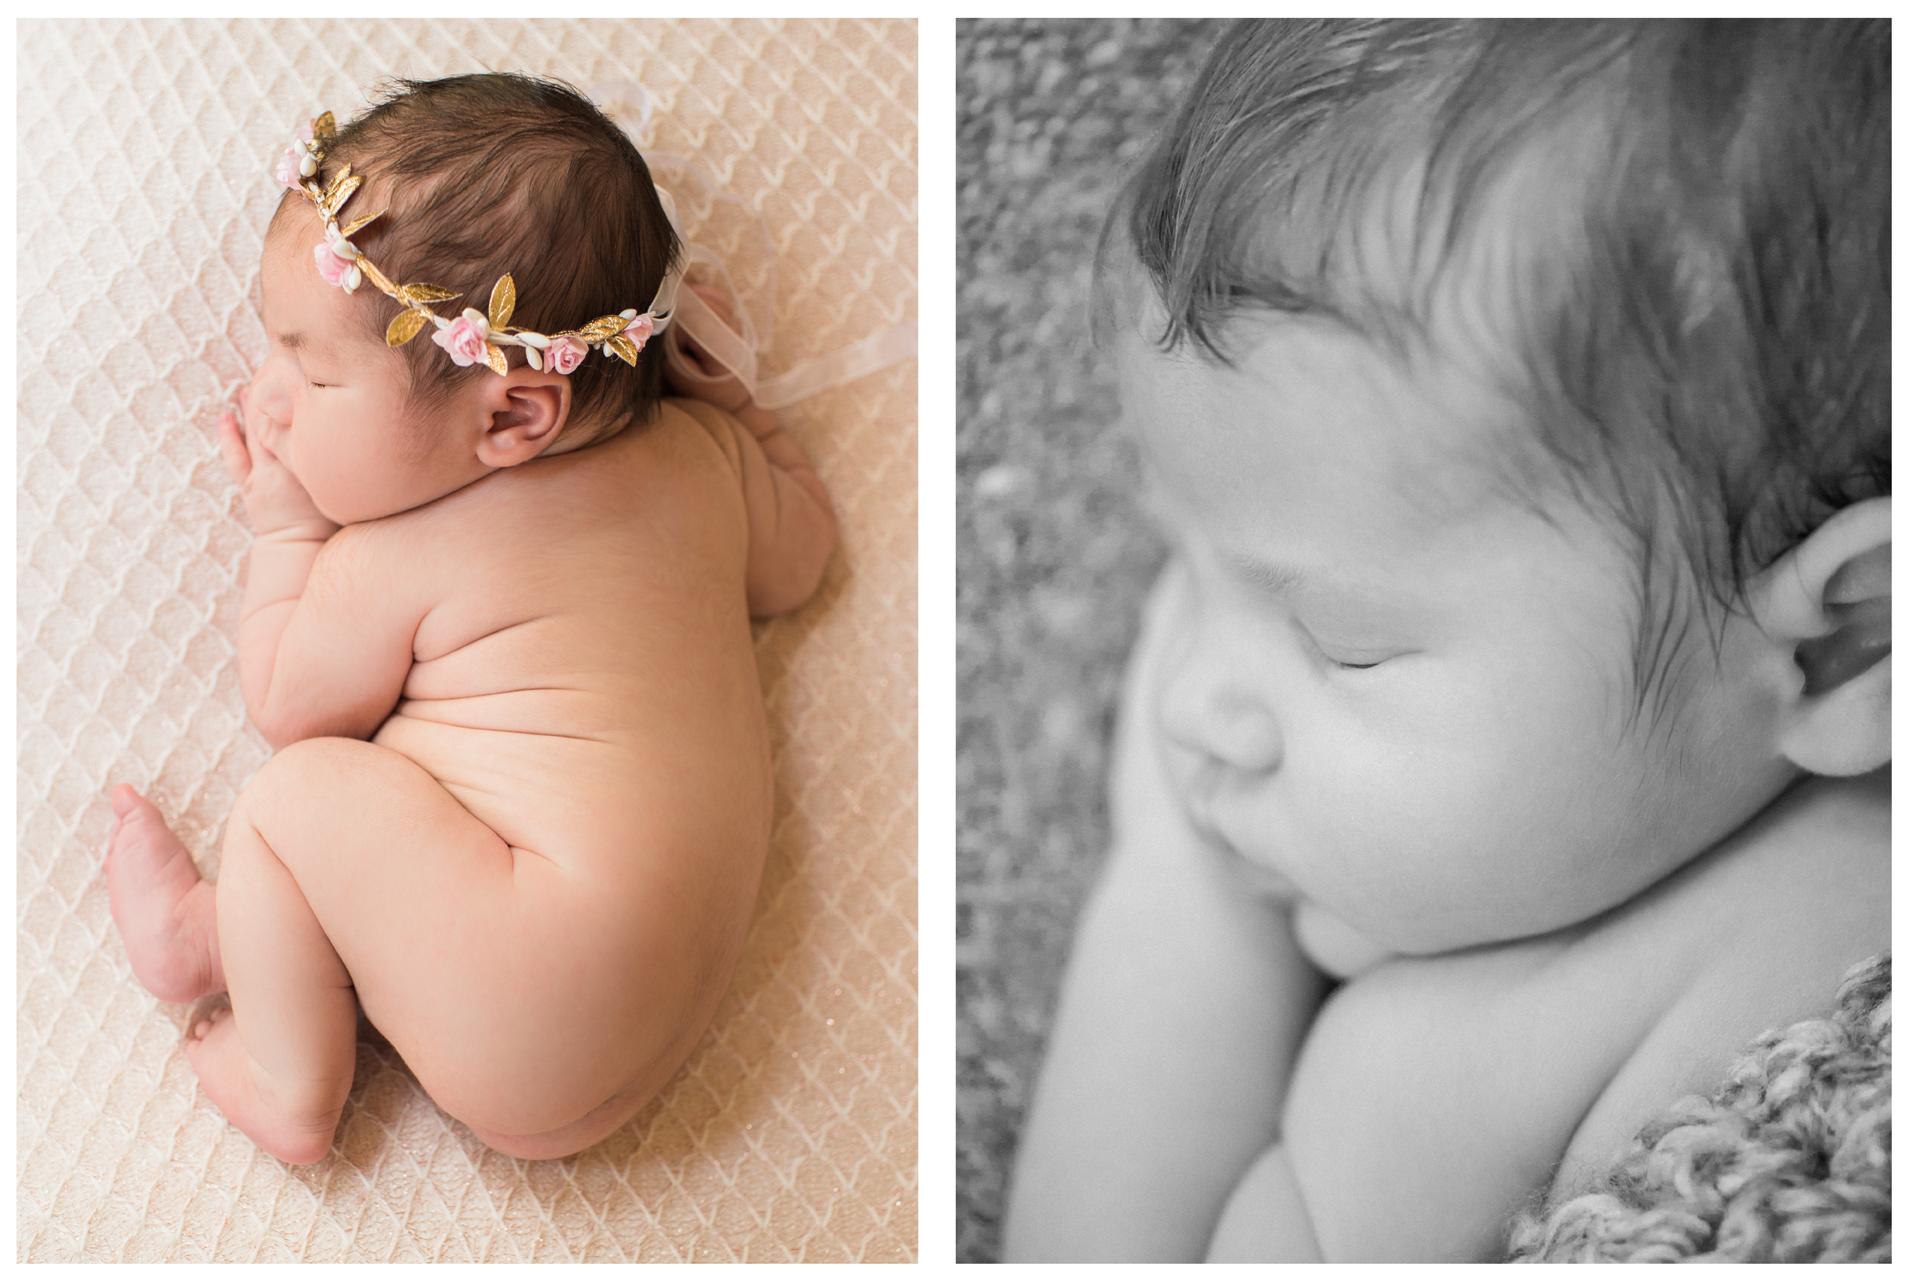 newborn-Photographer-Sweet-Light-Portraits97.jpg